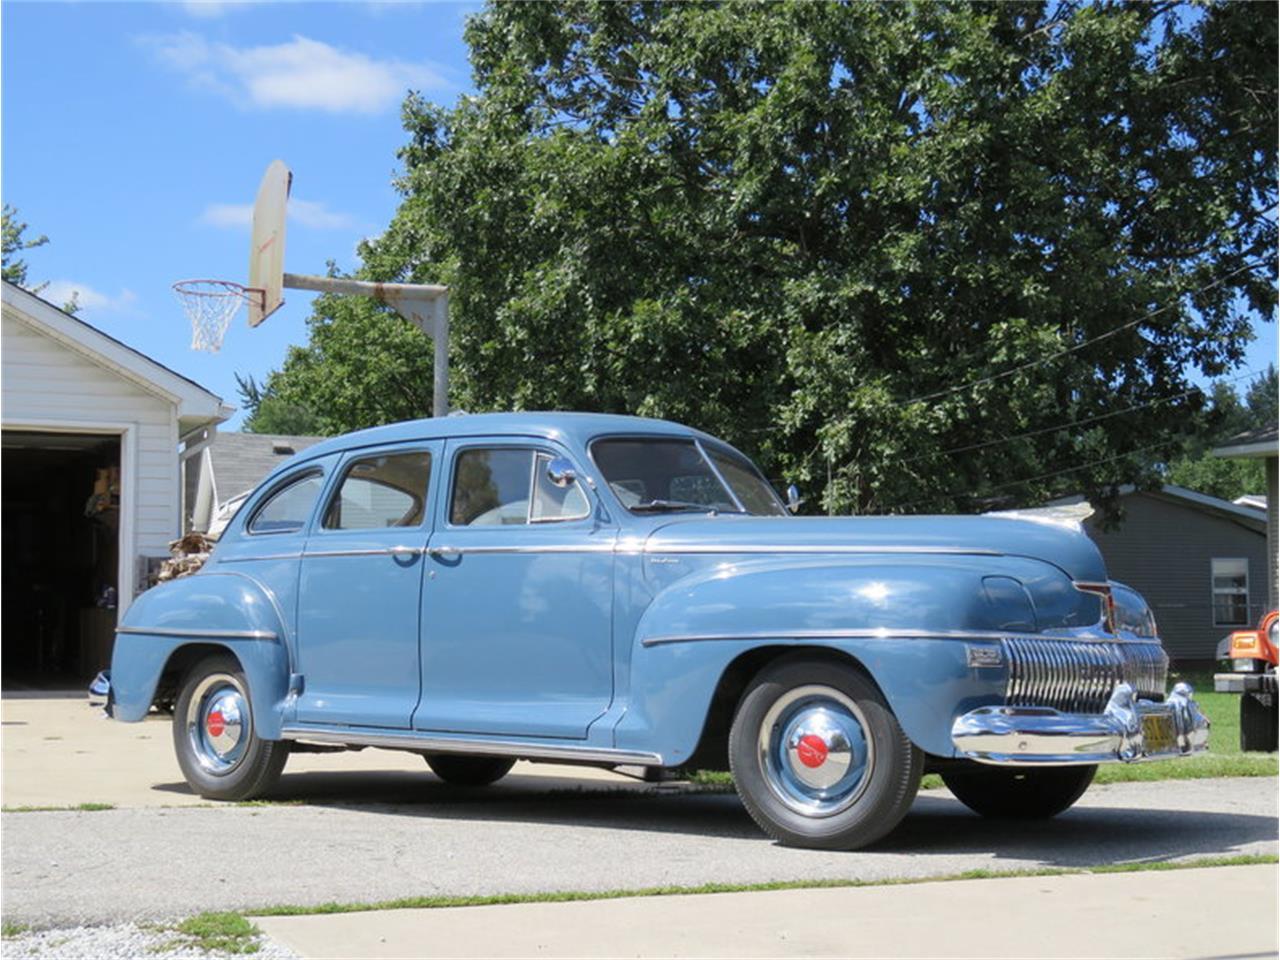 Kokomo Car Dealers >> 1942 DeSoto Deluxe for Sale | ClassicCars.com | CC-1144796